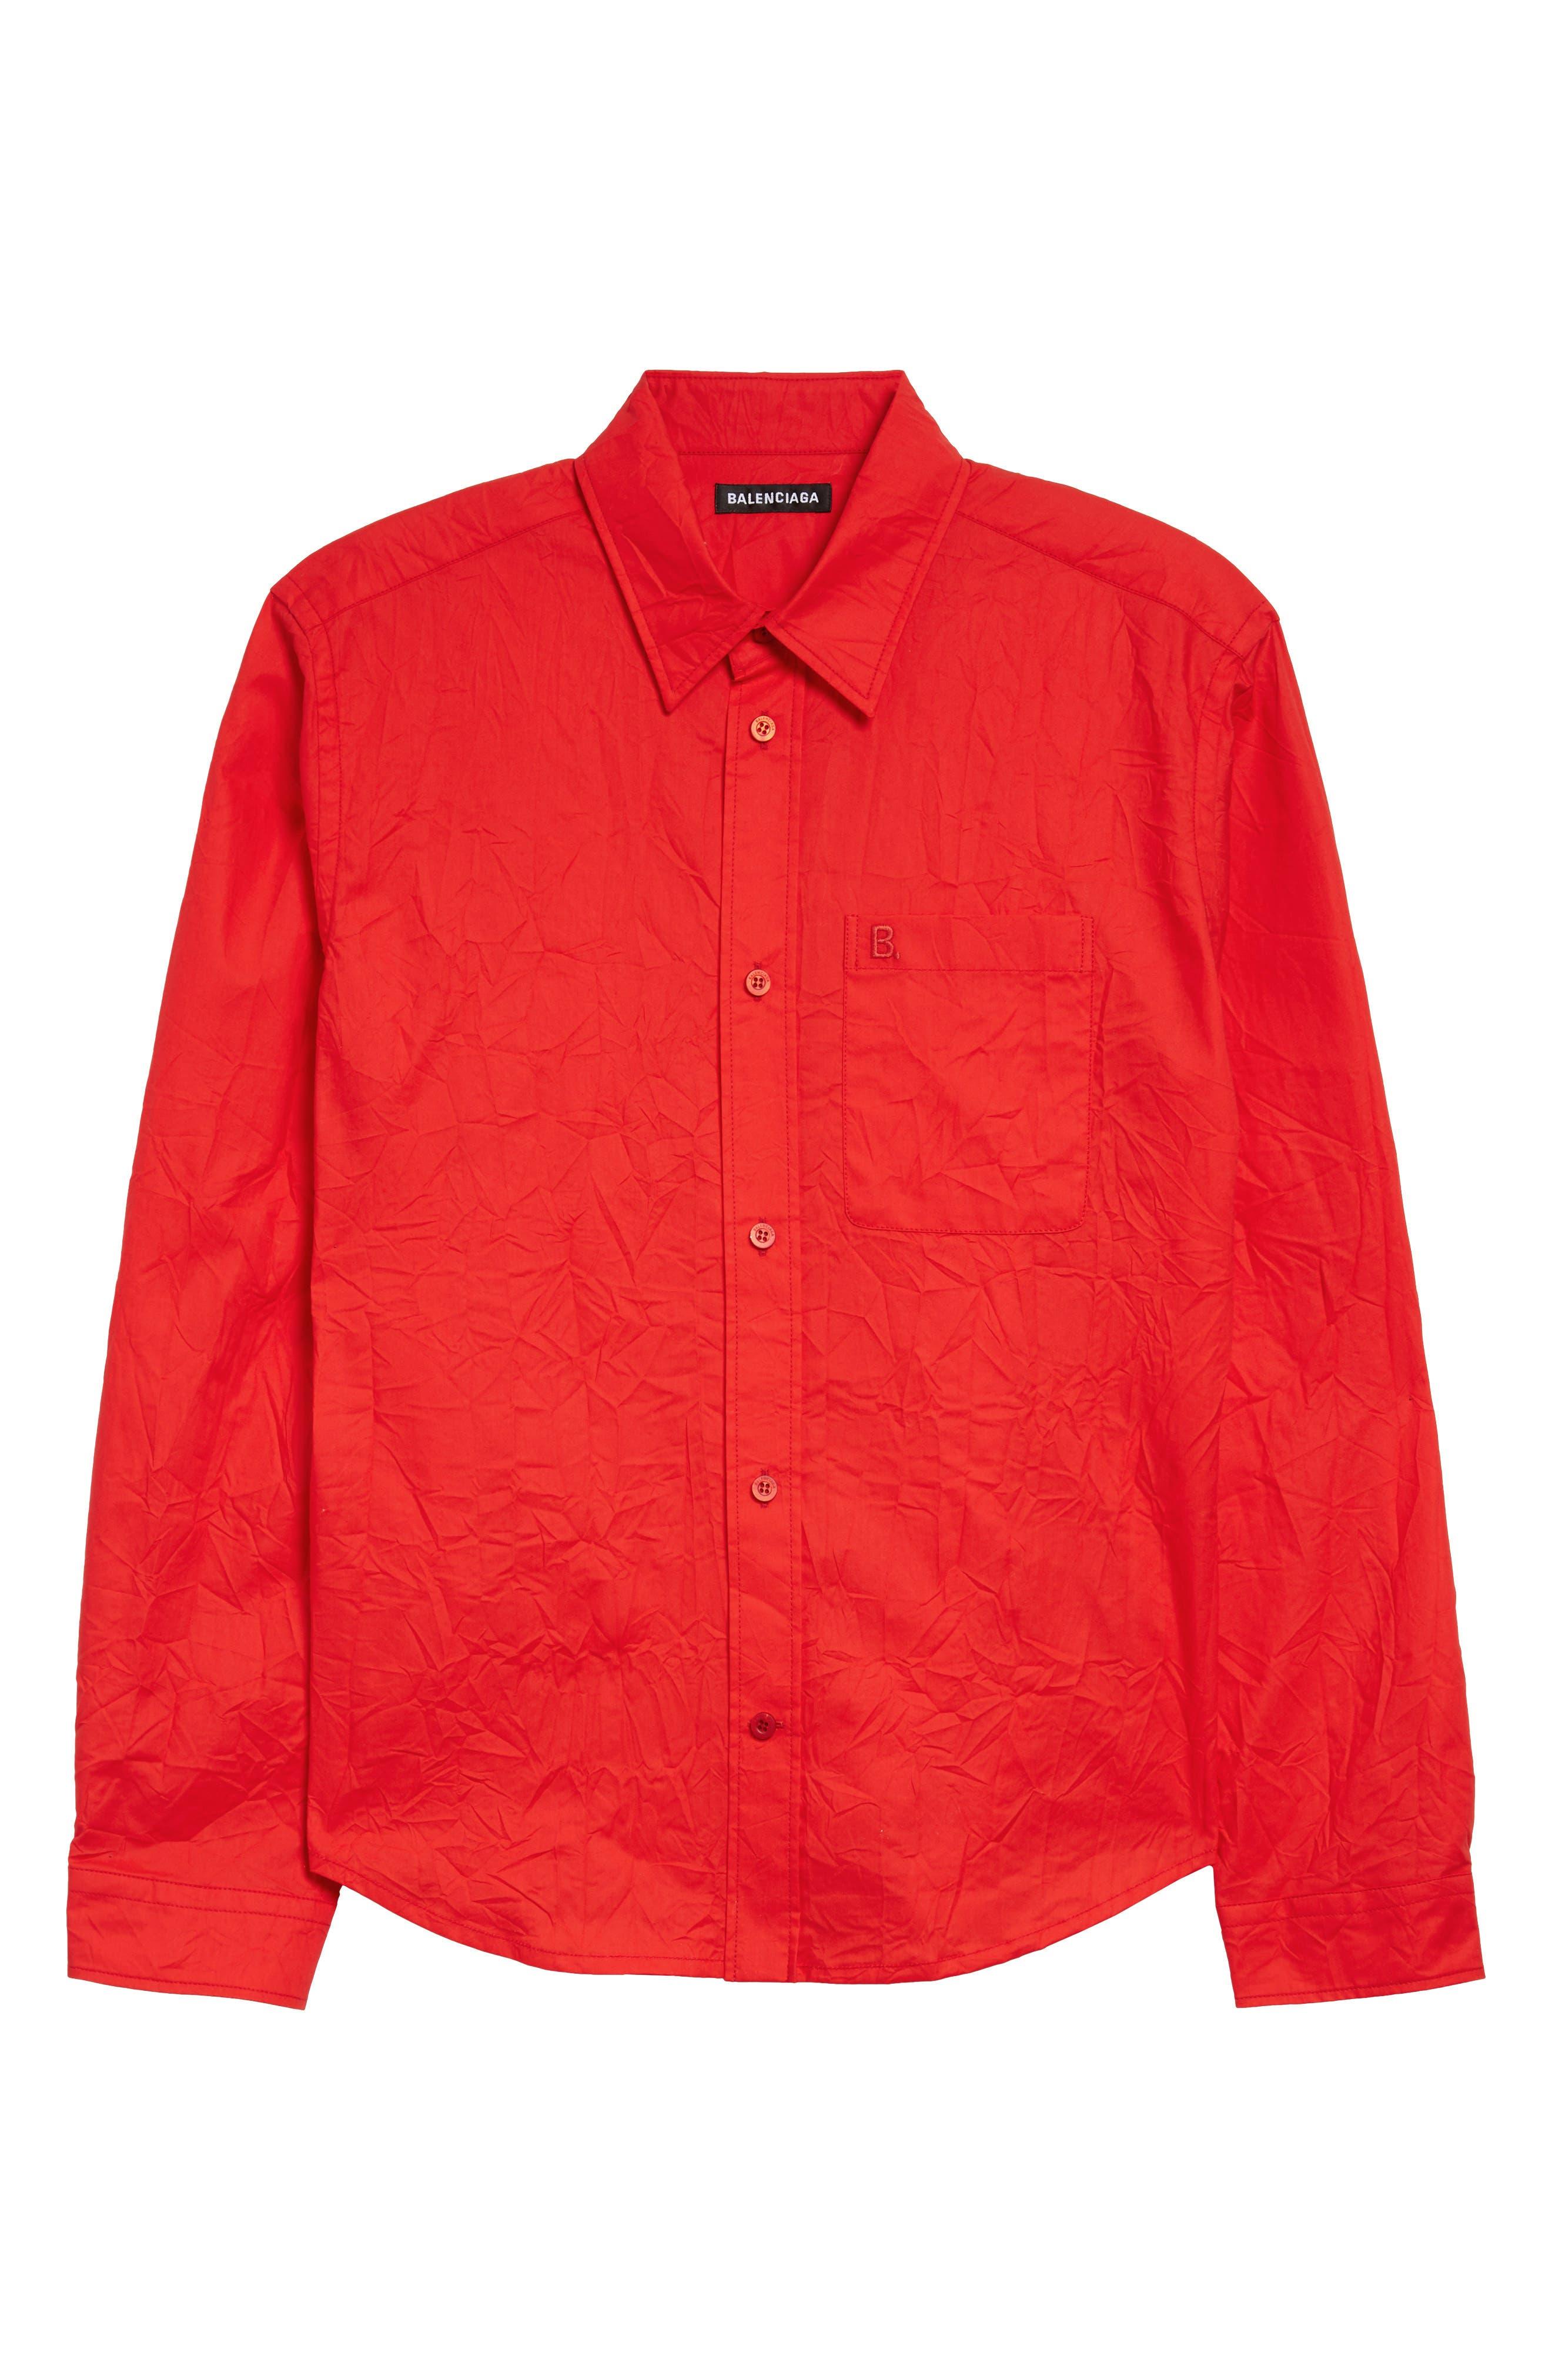 Image of Balenciaga Crinkled Poplin Button-Up Shirt